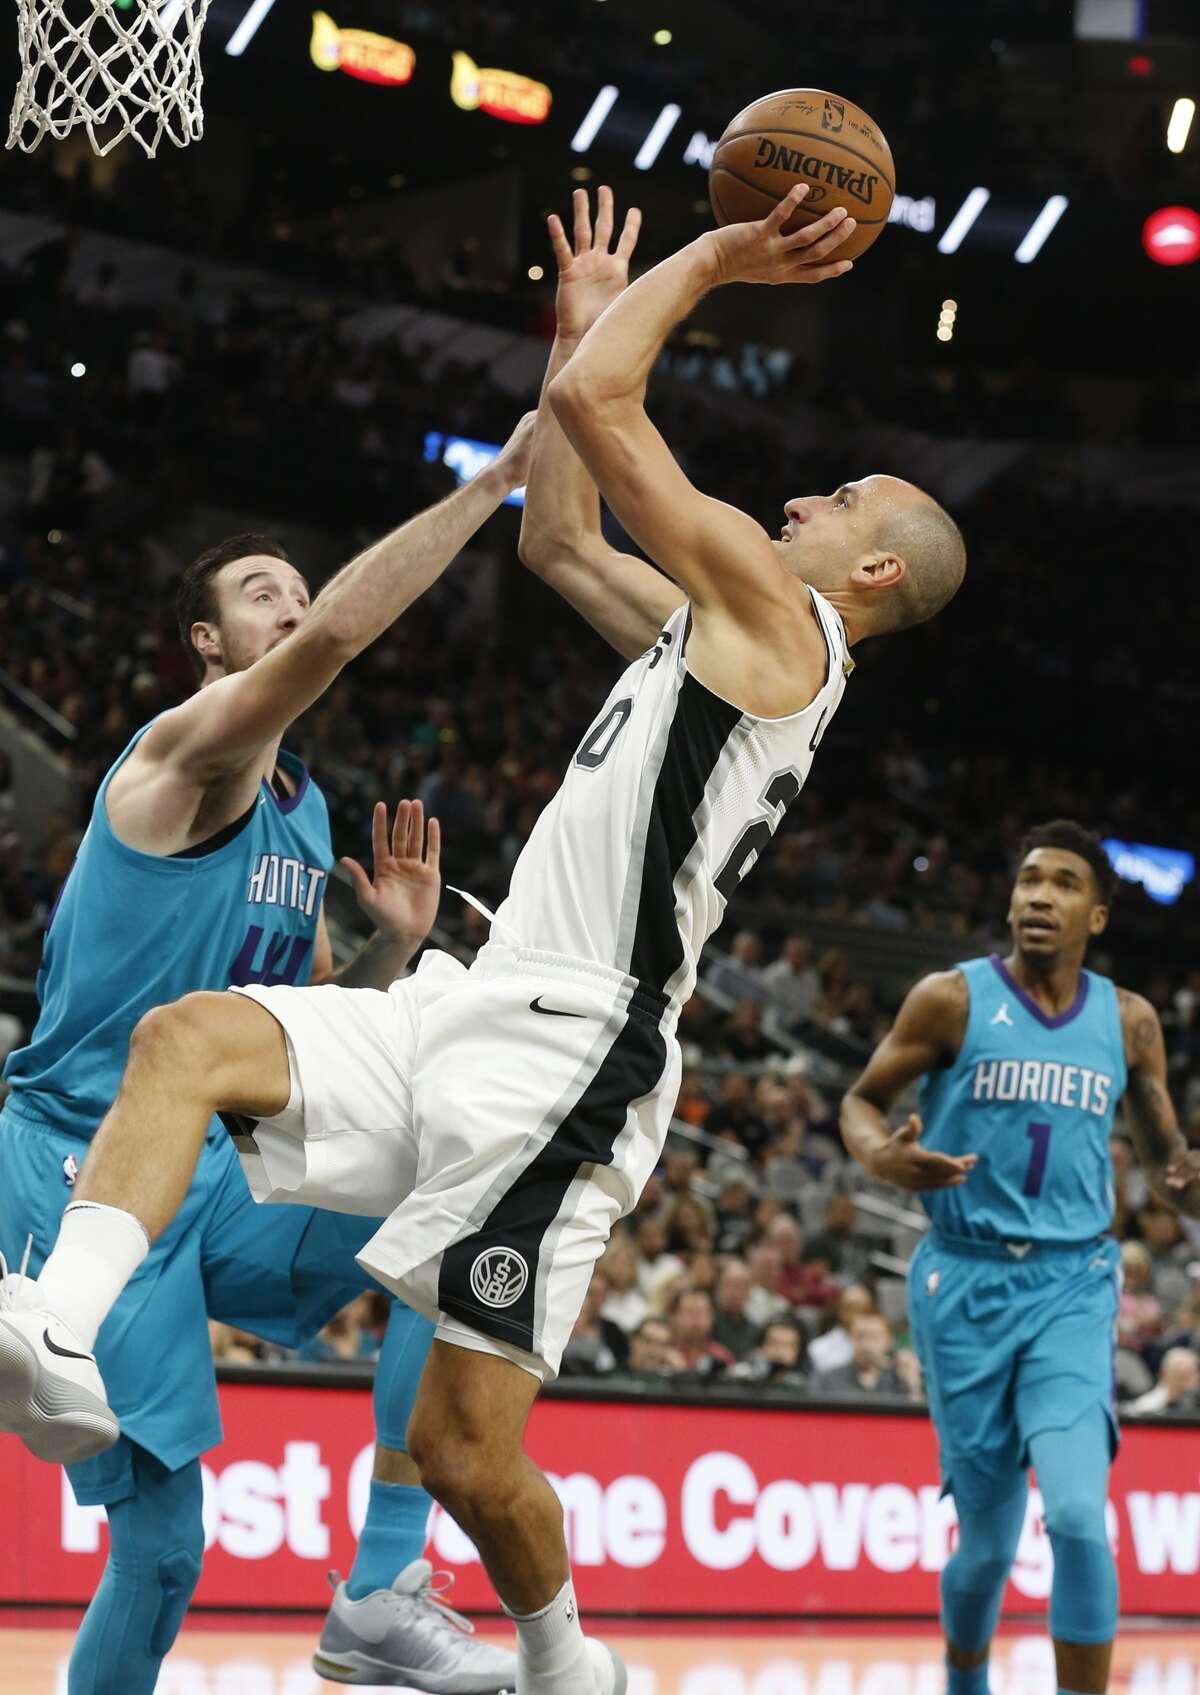 Spurs' Manu Ginobili (20) takes a shot against Charlotte Hornets' Frank Kaminsky (44) at the AT&T Center on Friday, Nov. 3, 2017. (Kin Man Hui/San Antonio Express-News)